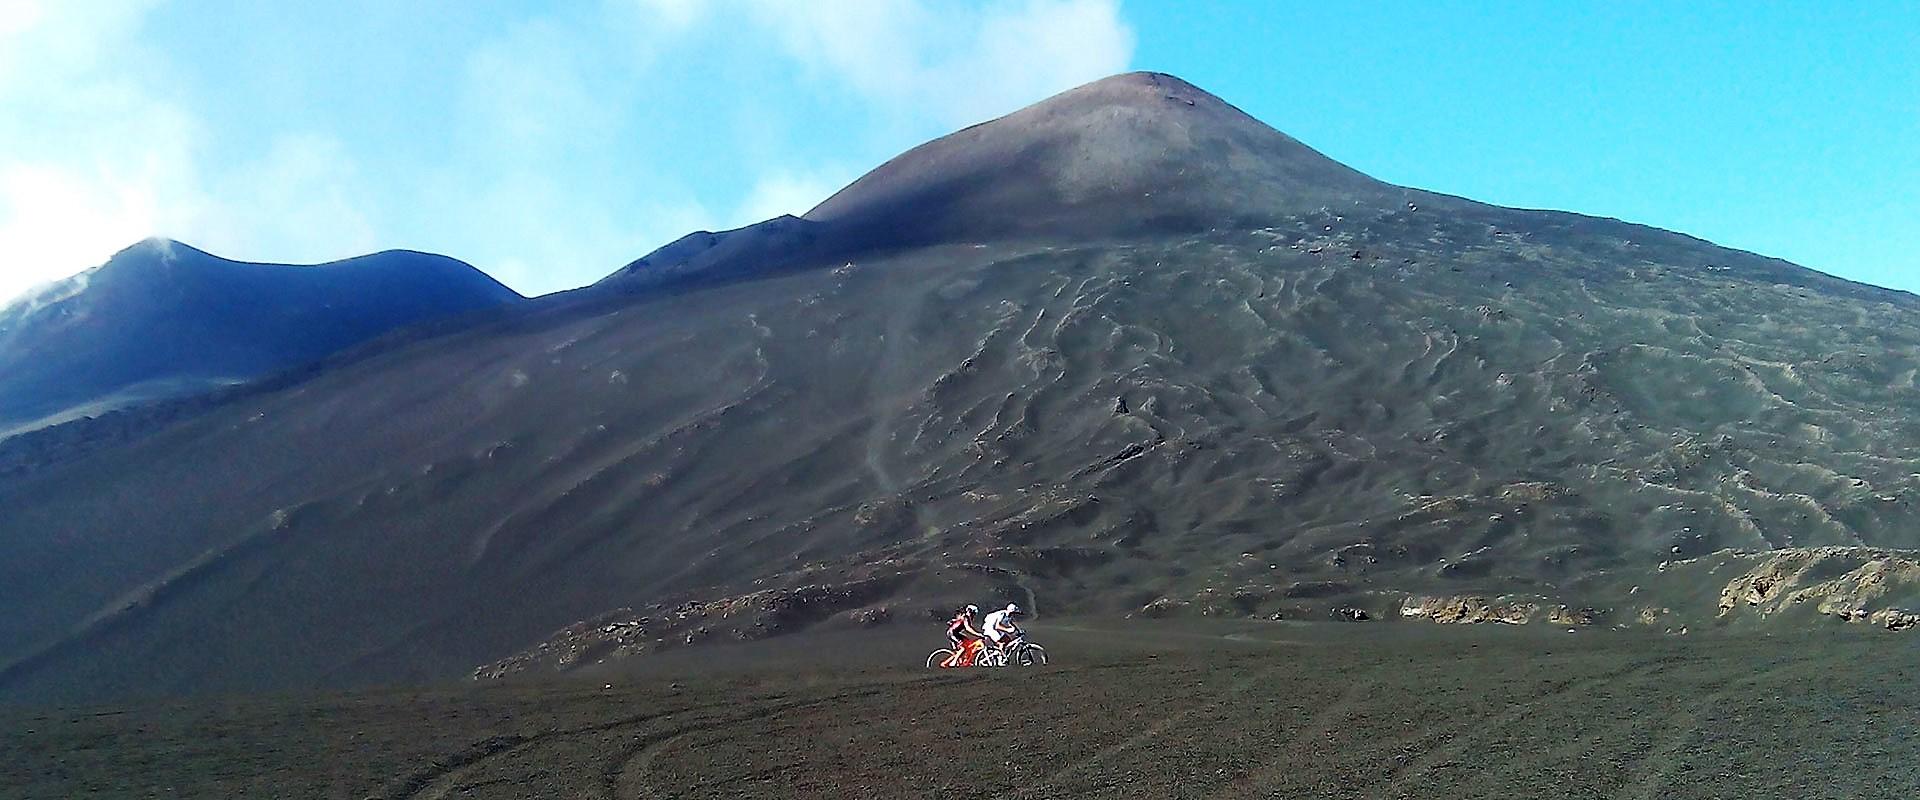 Mount Etna mtb - Piano delle Concazze